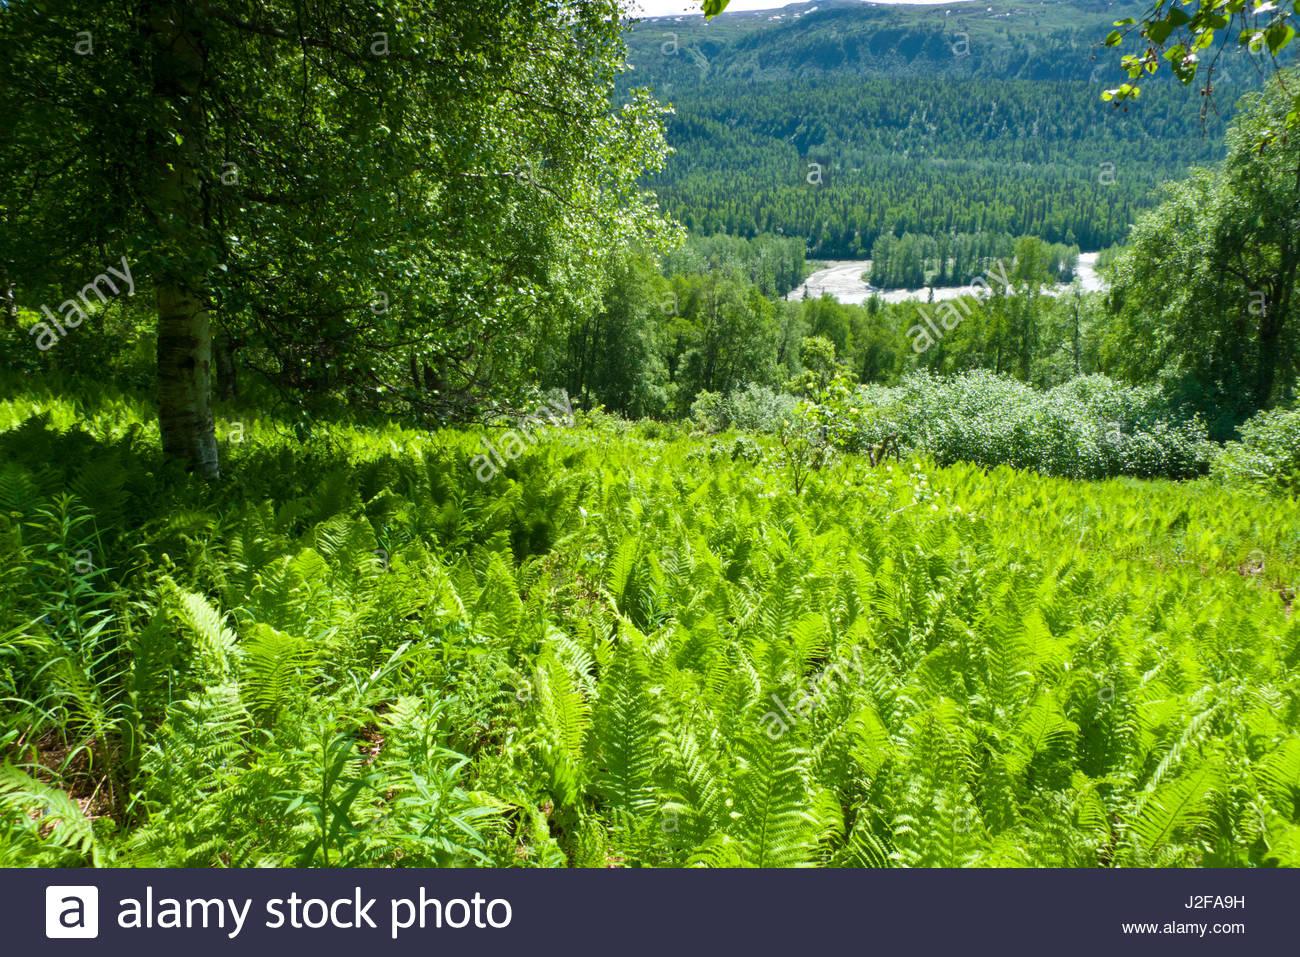 Alaska matanuska susitna county talkeetna - View Of The Susitna River From A Lush Green Hillside Above It Talkeetna Mountains